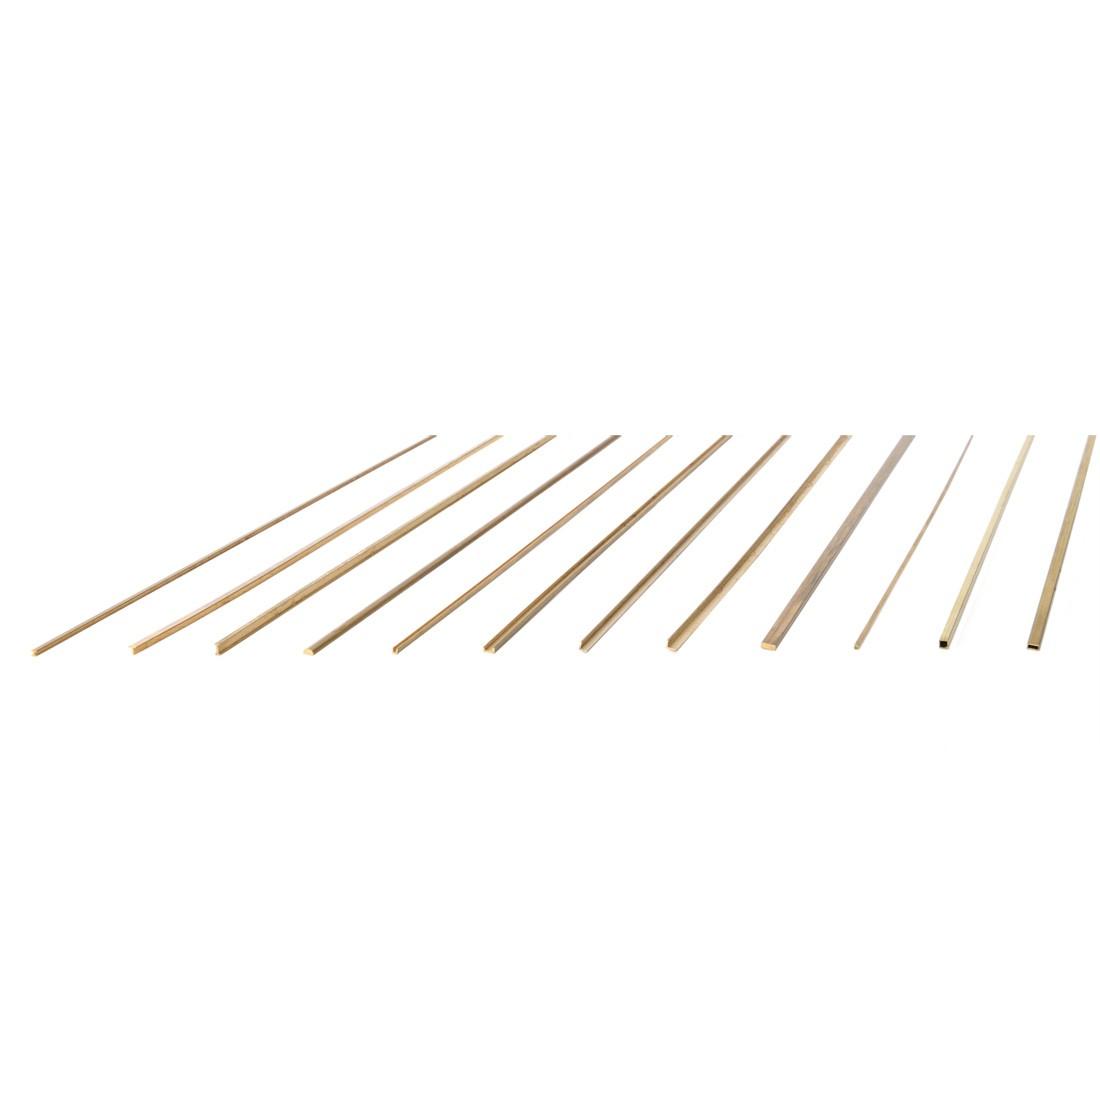 Brass angles 3x3x0,3